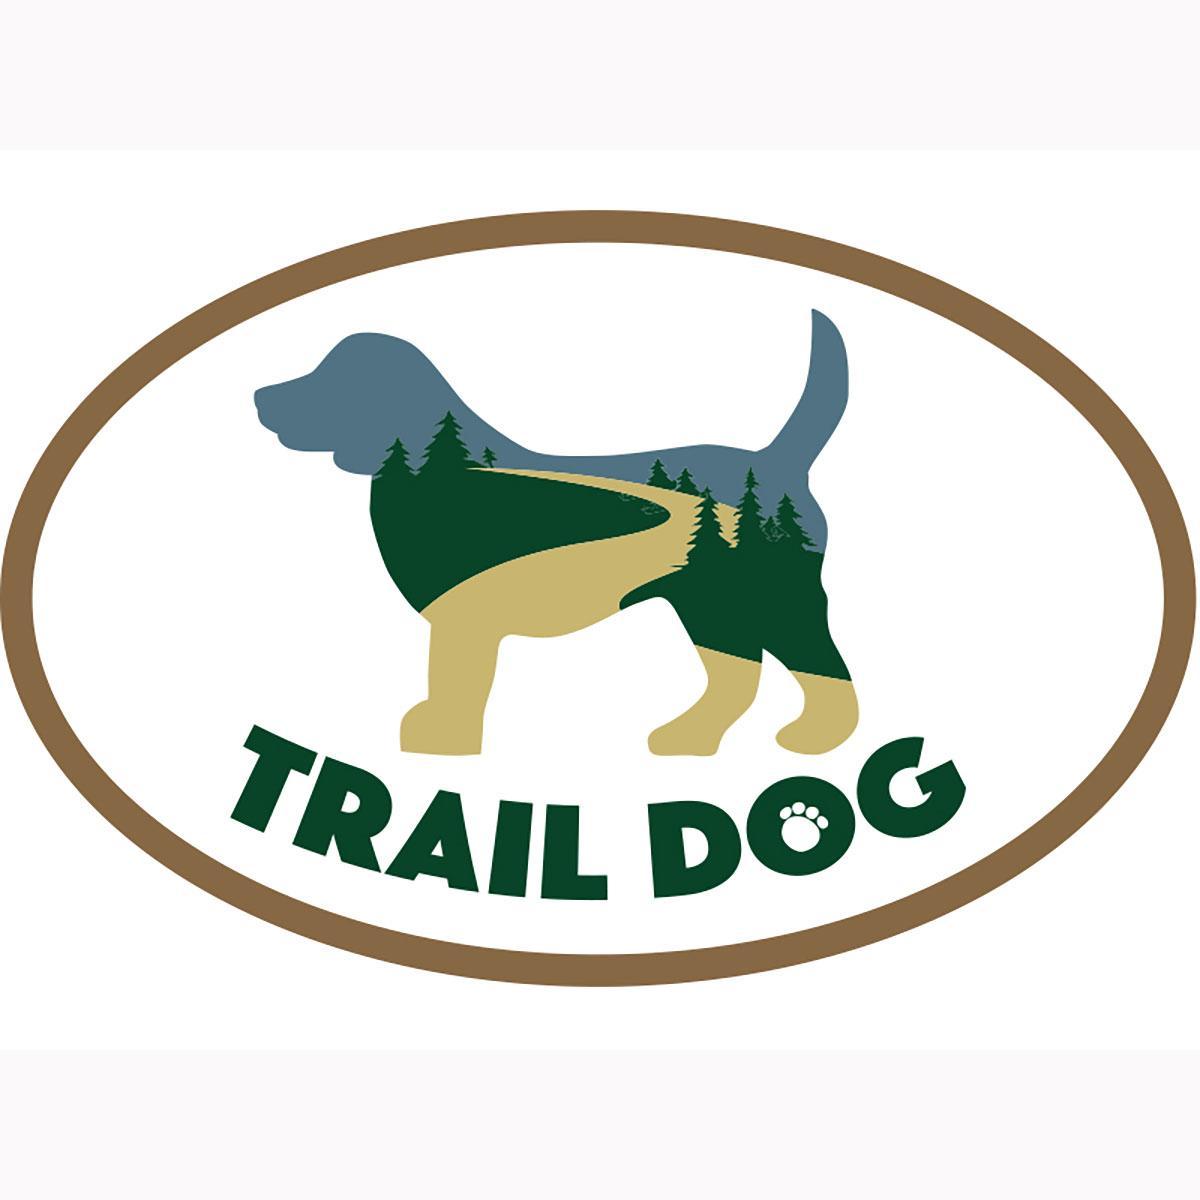 Trail Dog Oval Magnet by Dog Speak